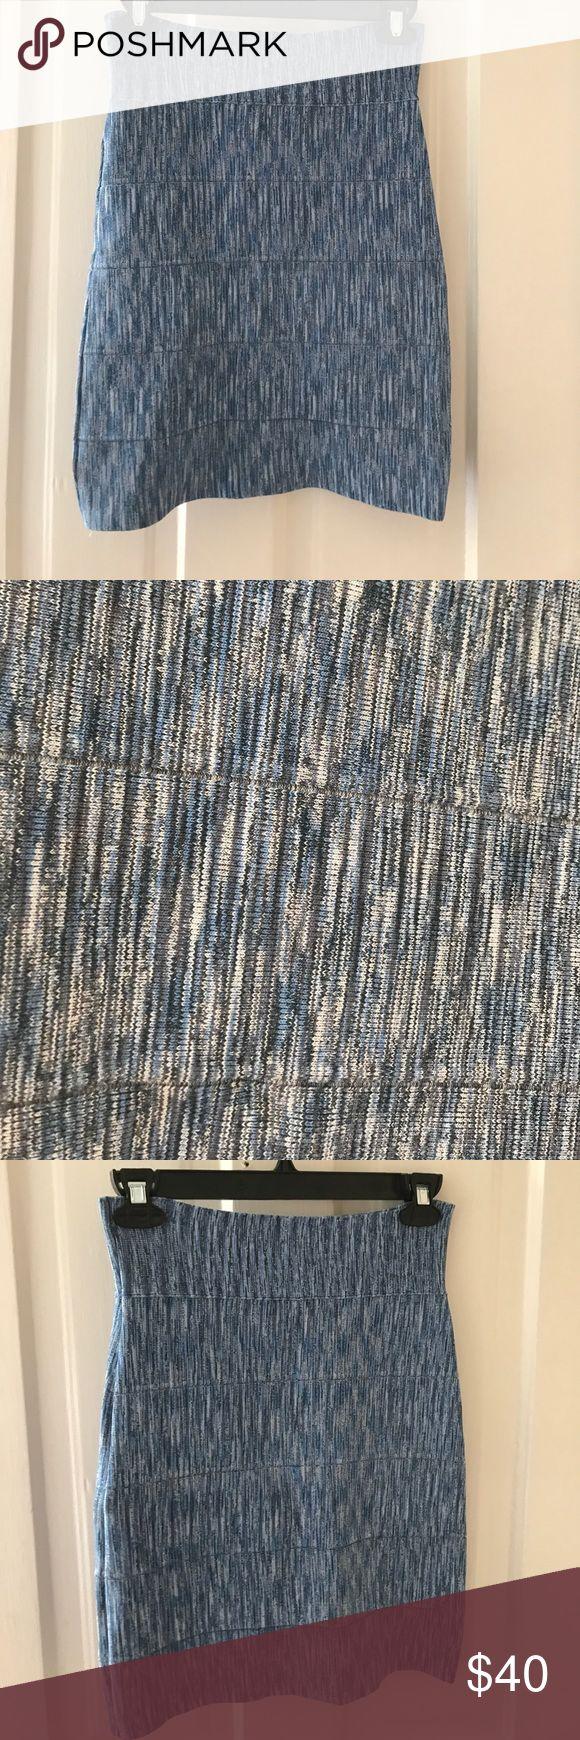 BCBGMAXAZRIA tight blue patterned skirt BCBGMAXAZRIA tight skirt. Size Small. Blue pattern. BCBGMaxAzria Skirts